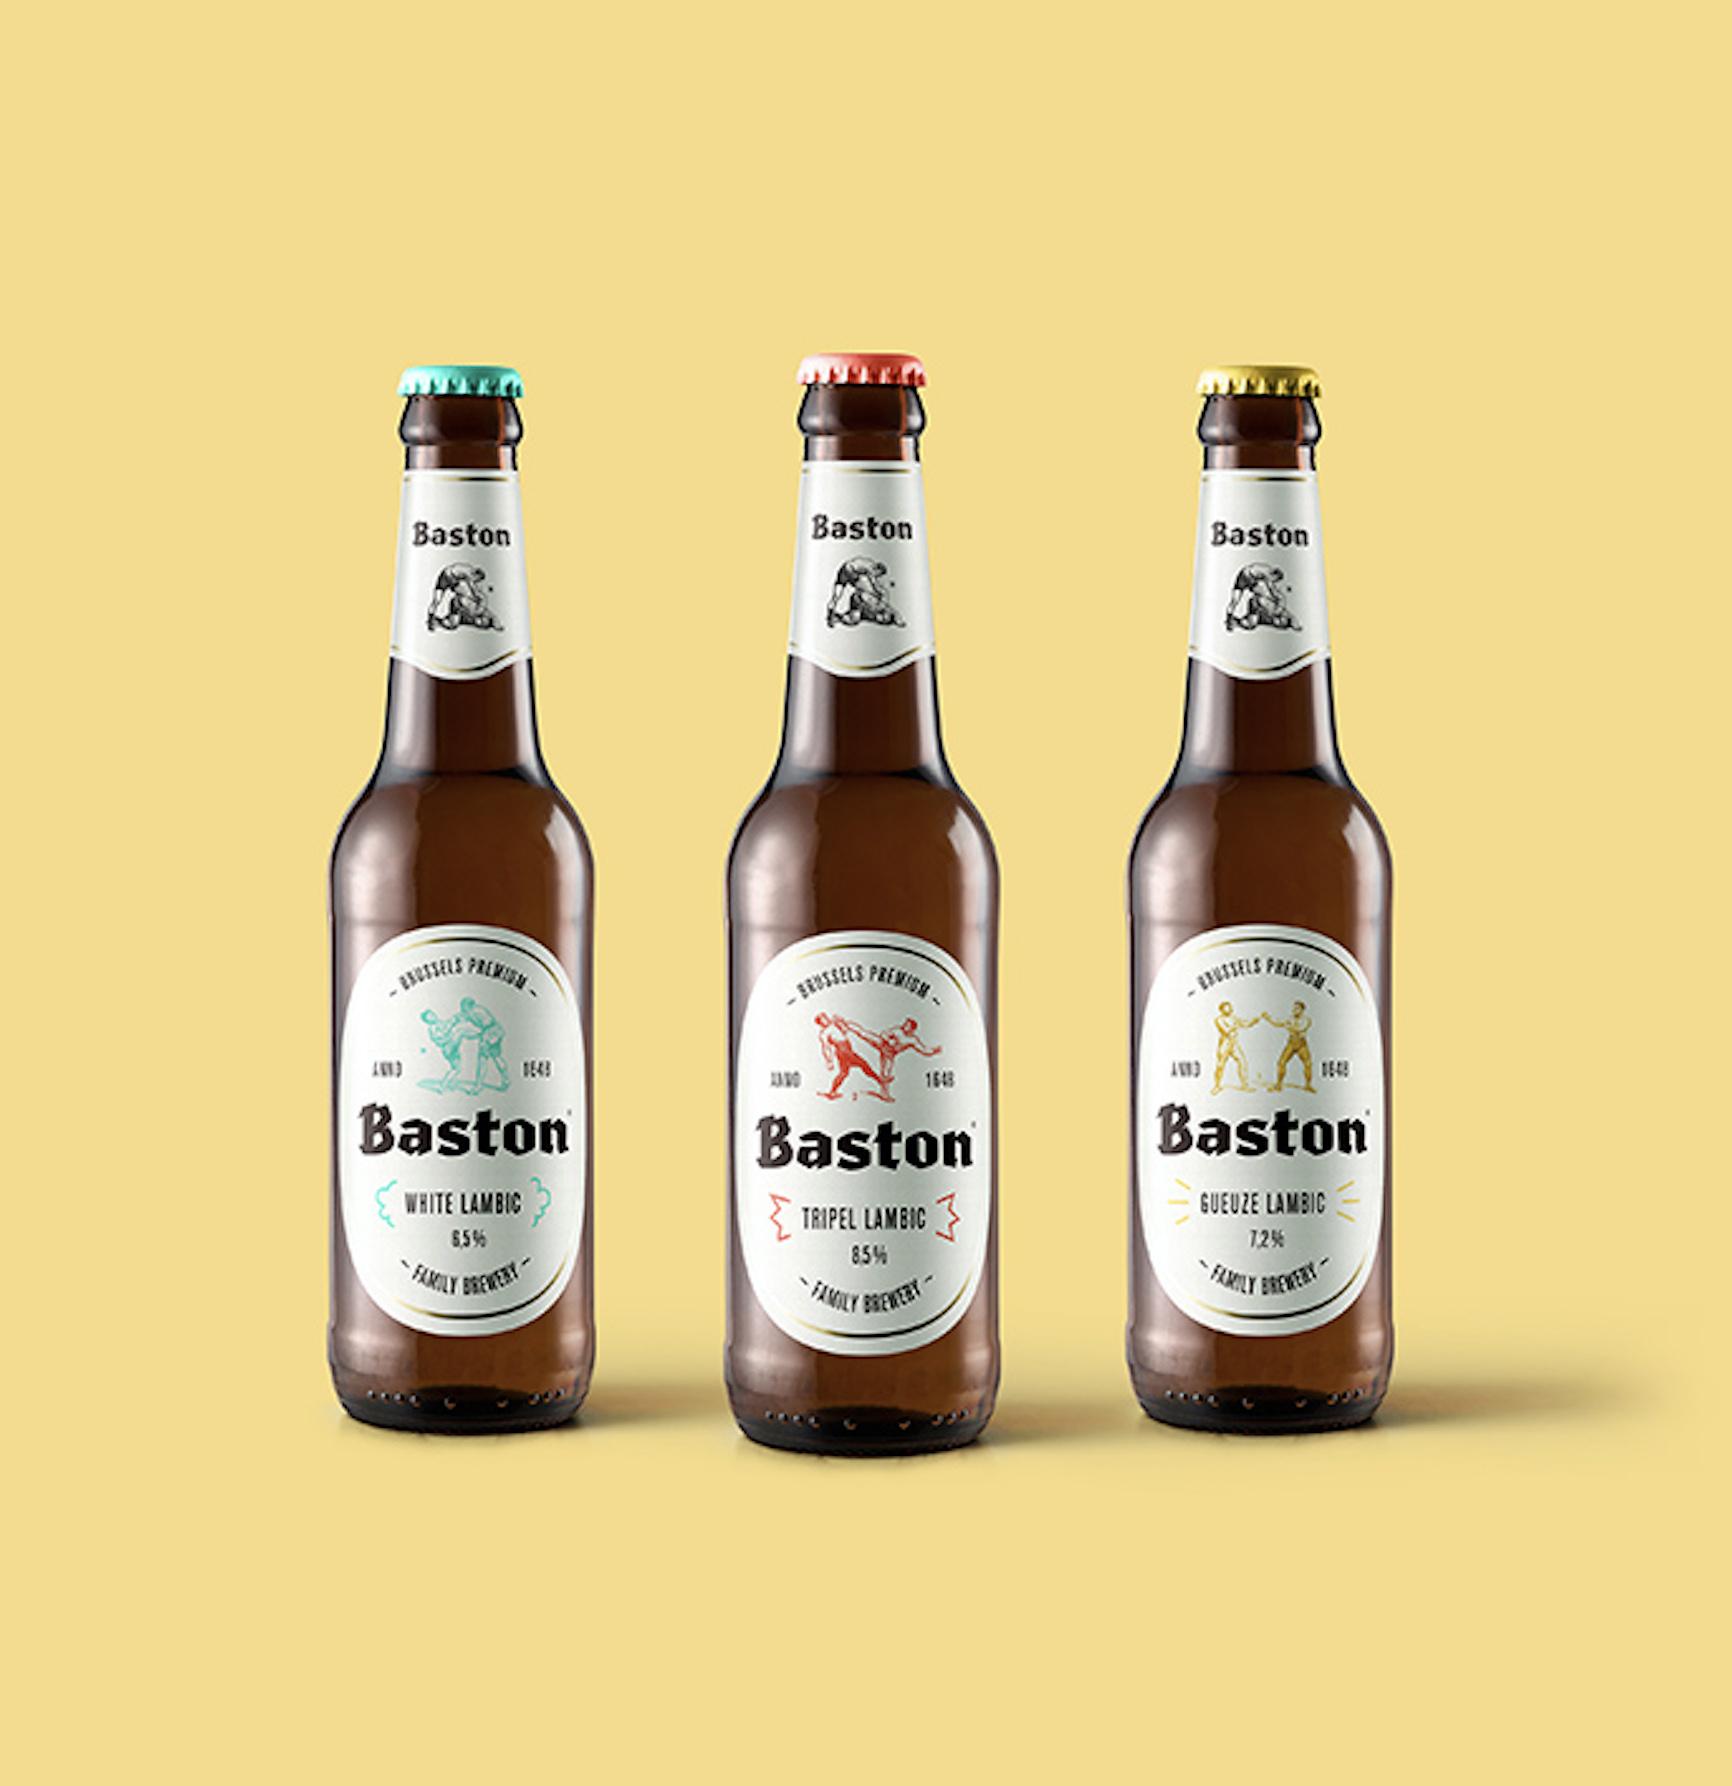 Baston Beer Brewery